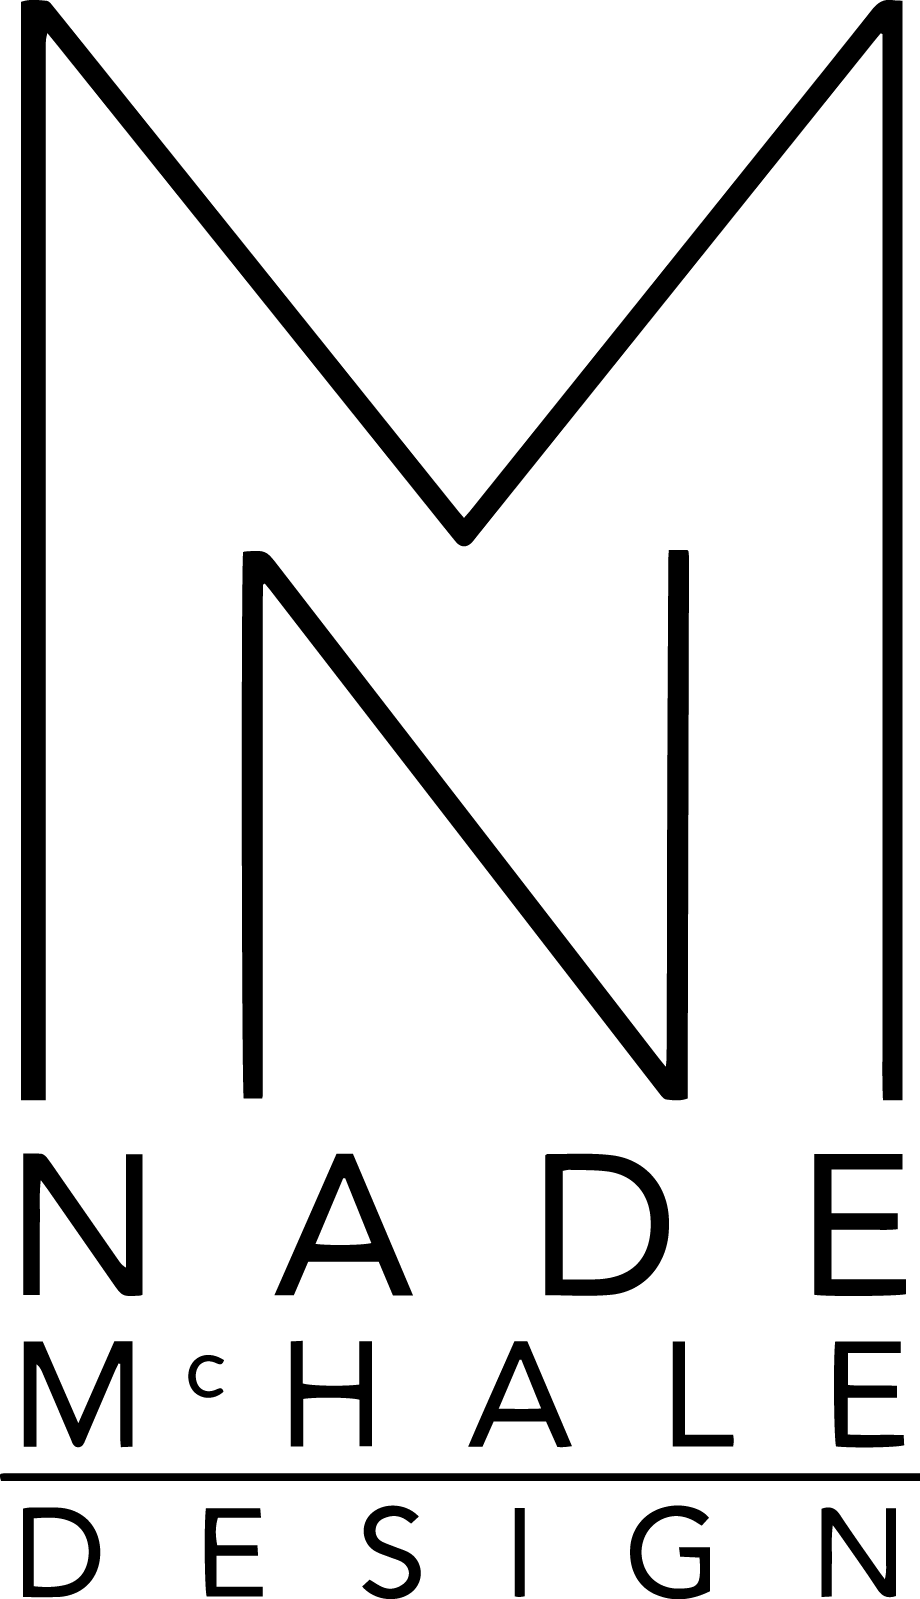 Nade McHale